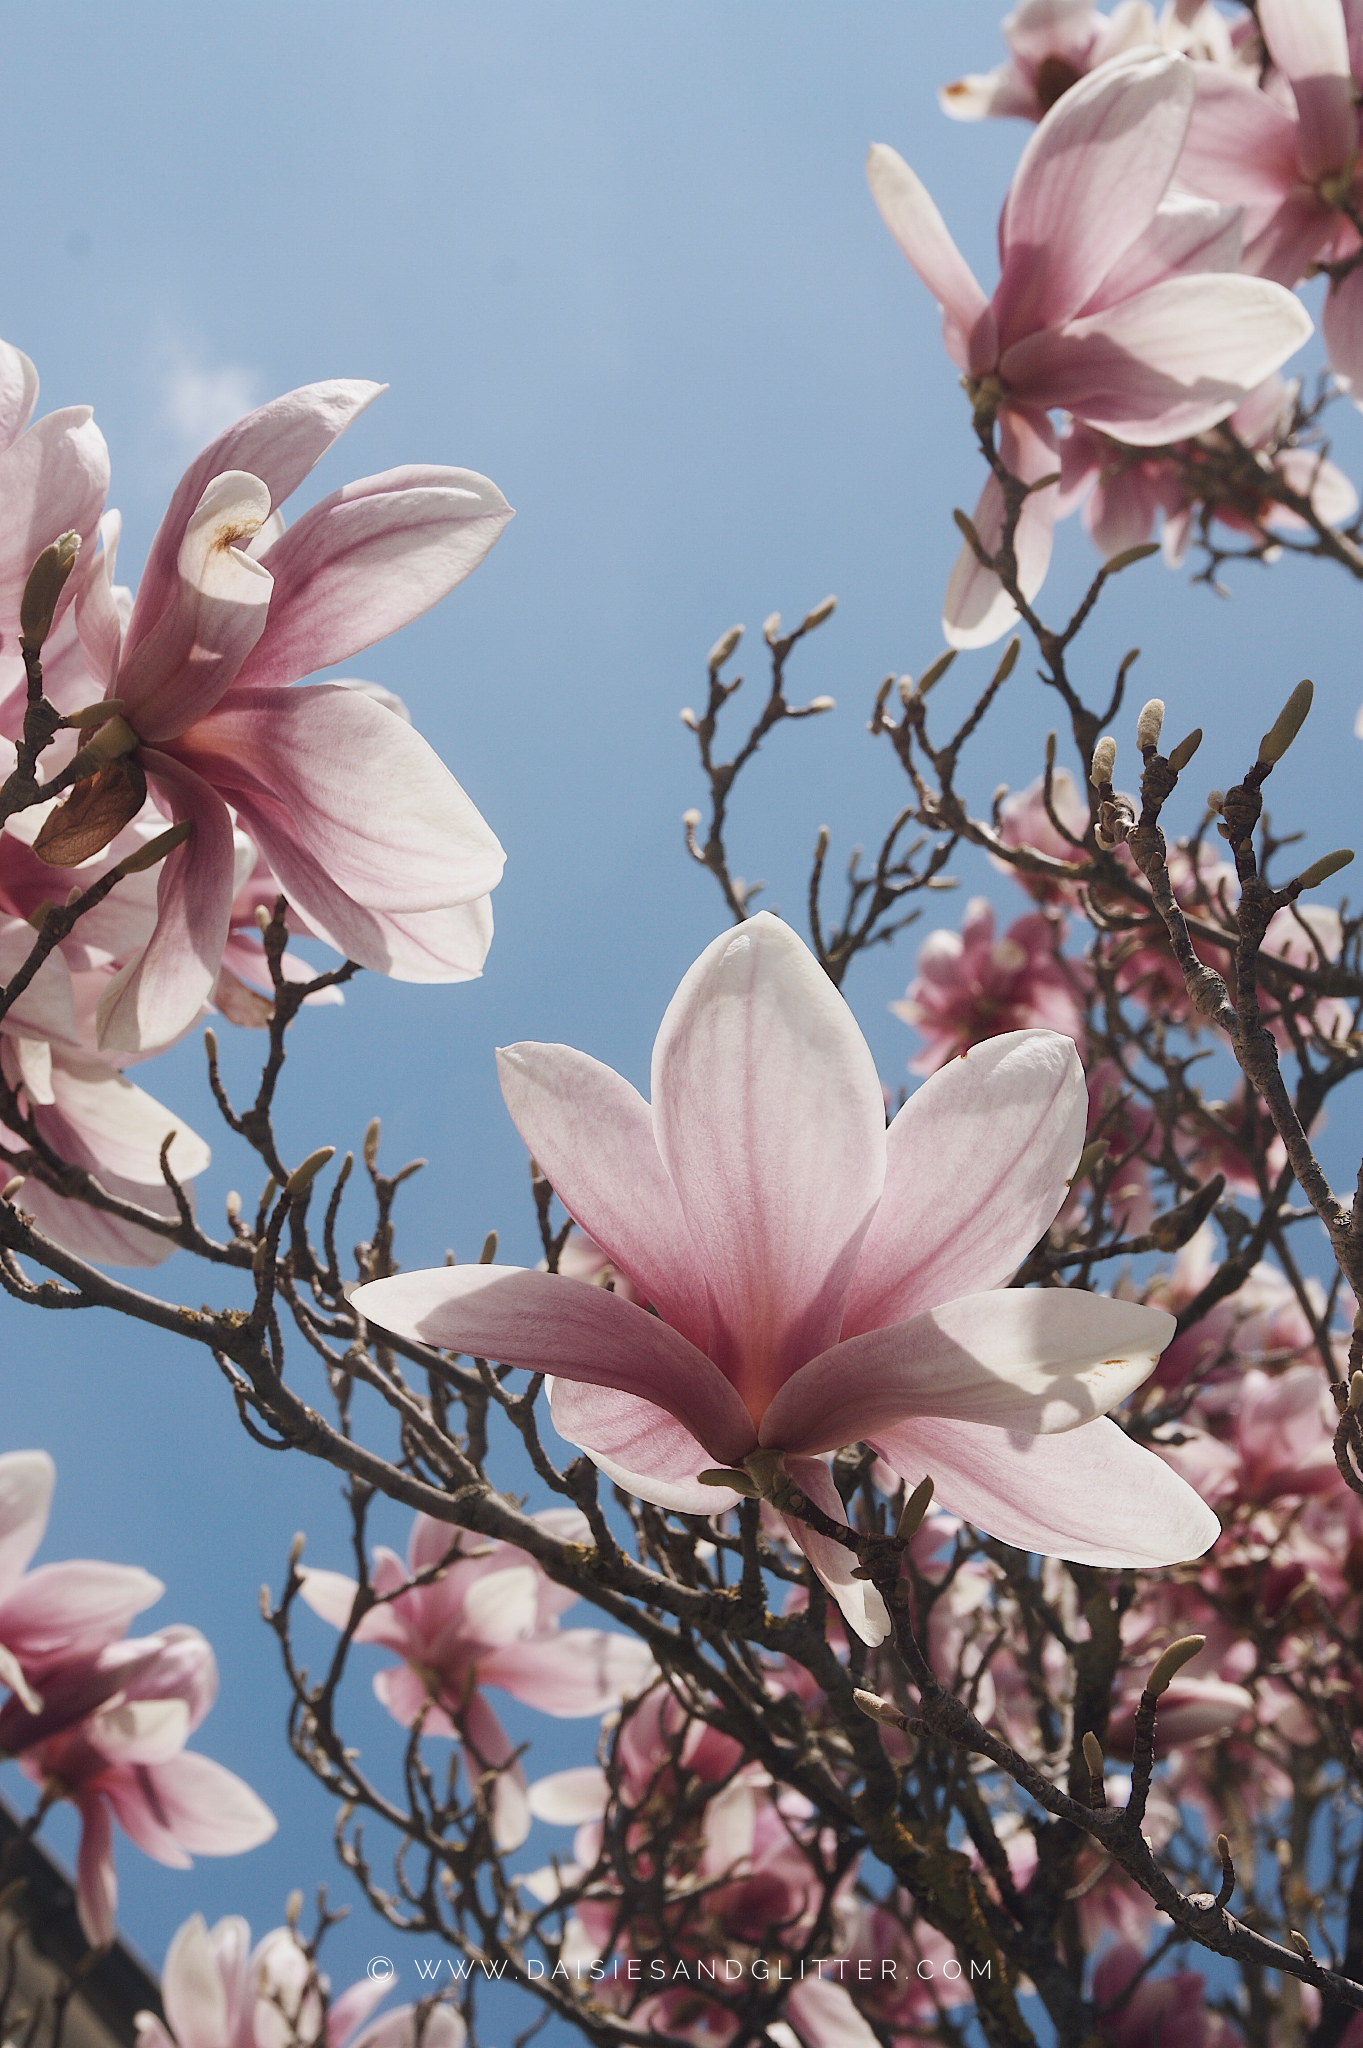 Wallpaper Magnolienbaum